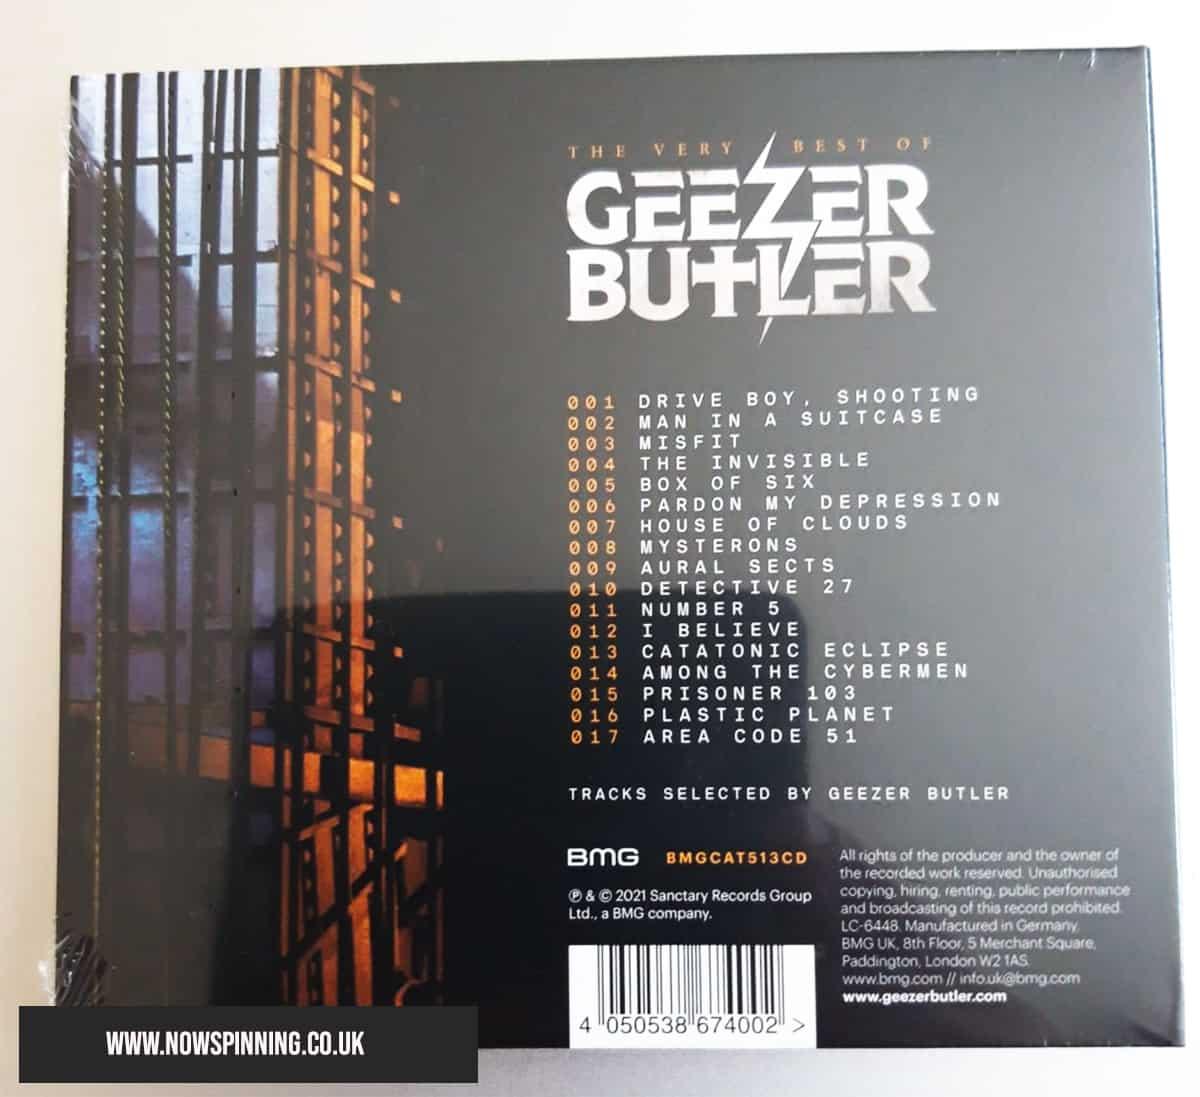 The Best of Geezer Butler - tracklisting